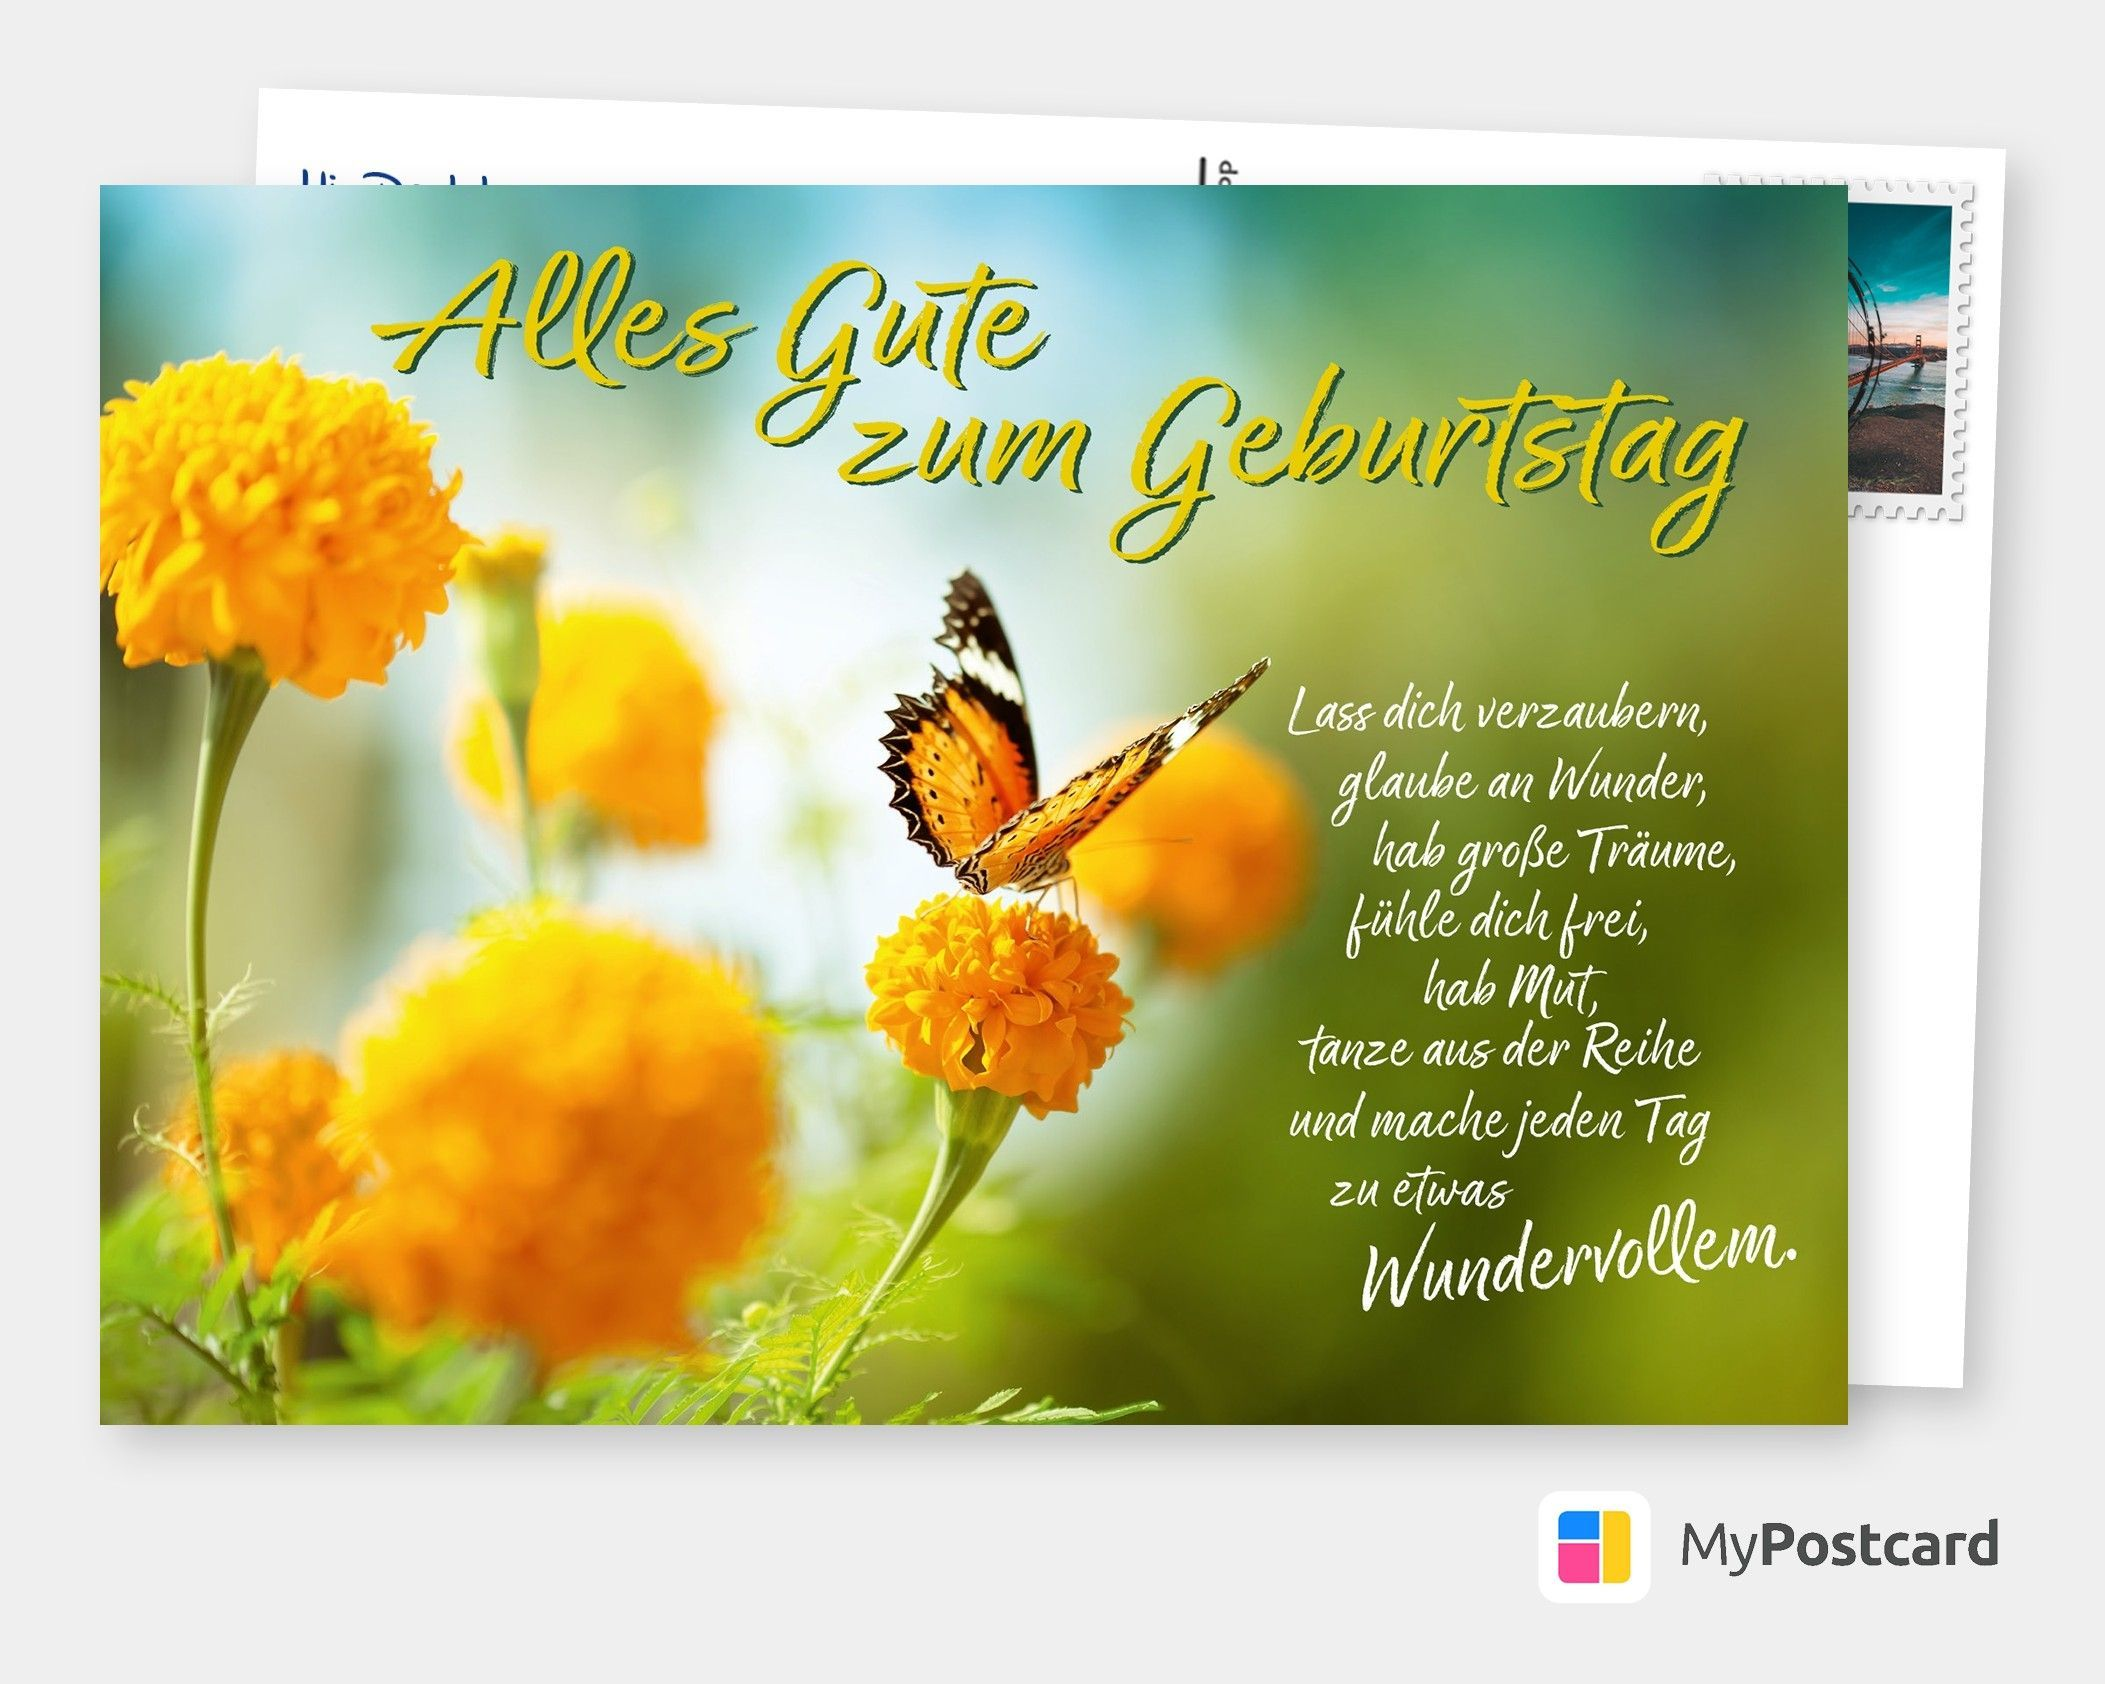 Geburtstagskarte - Geburtstagsgrüße / Geburtstagskarte